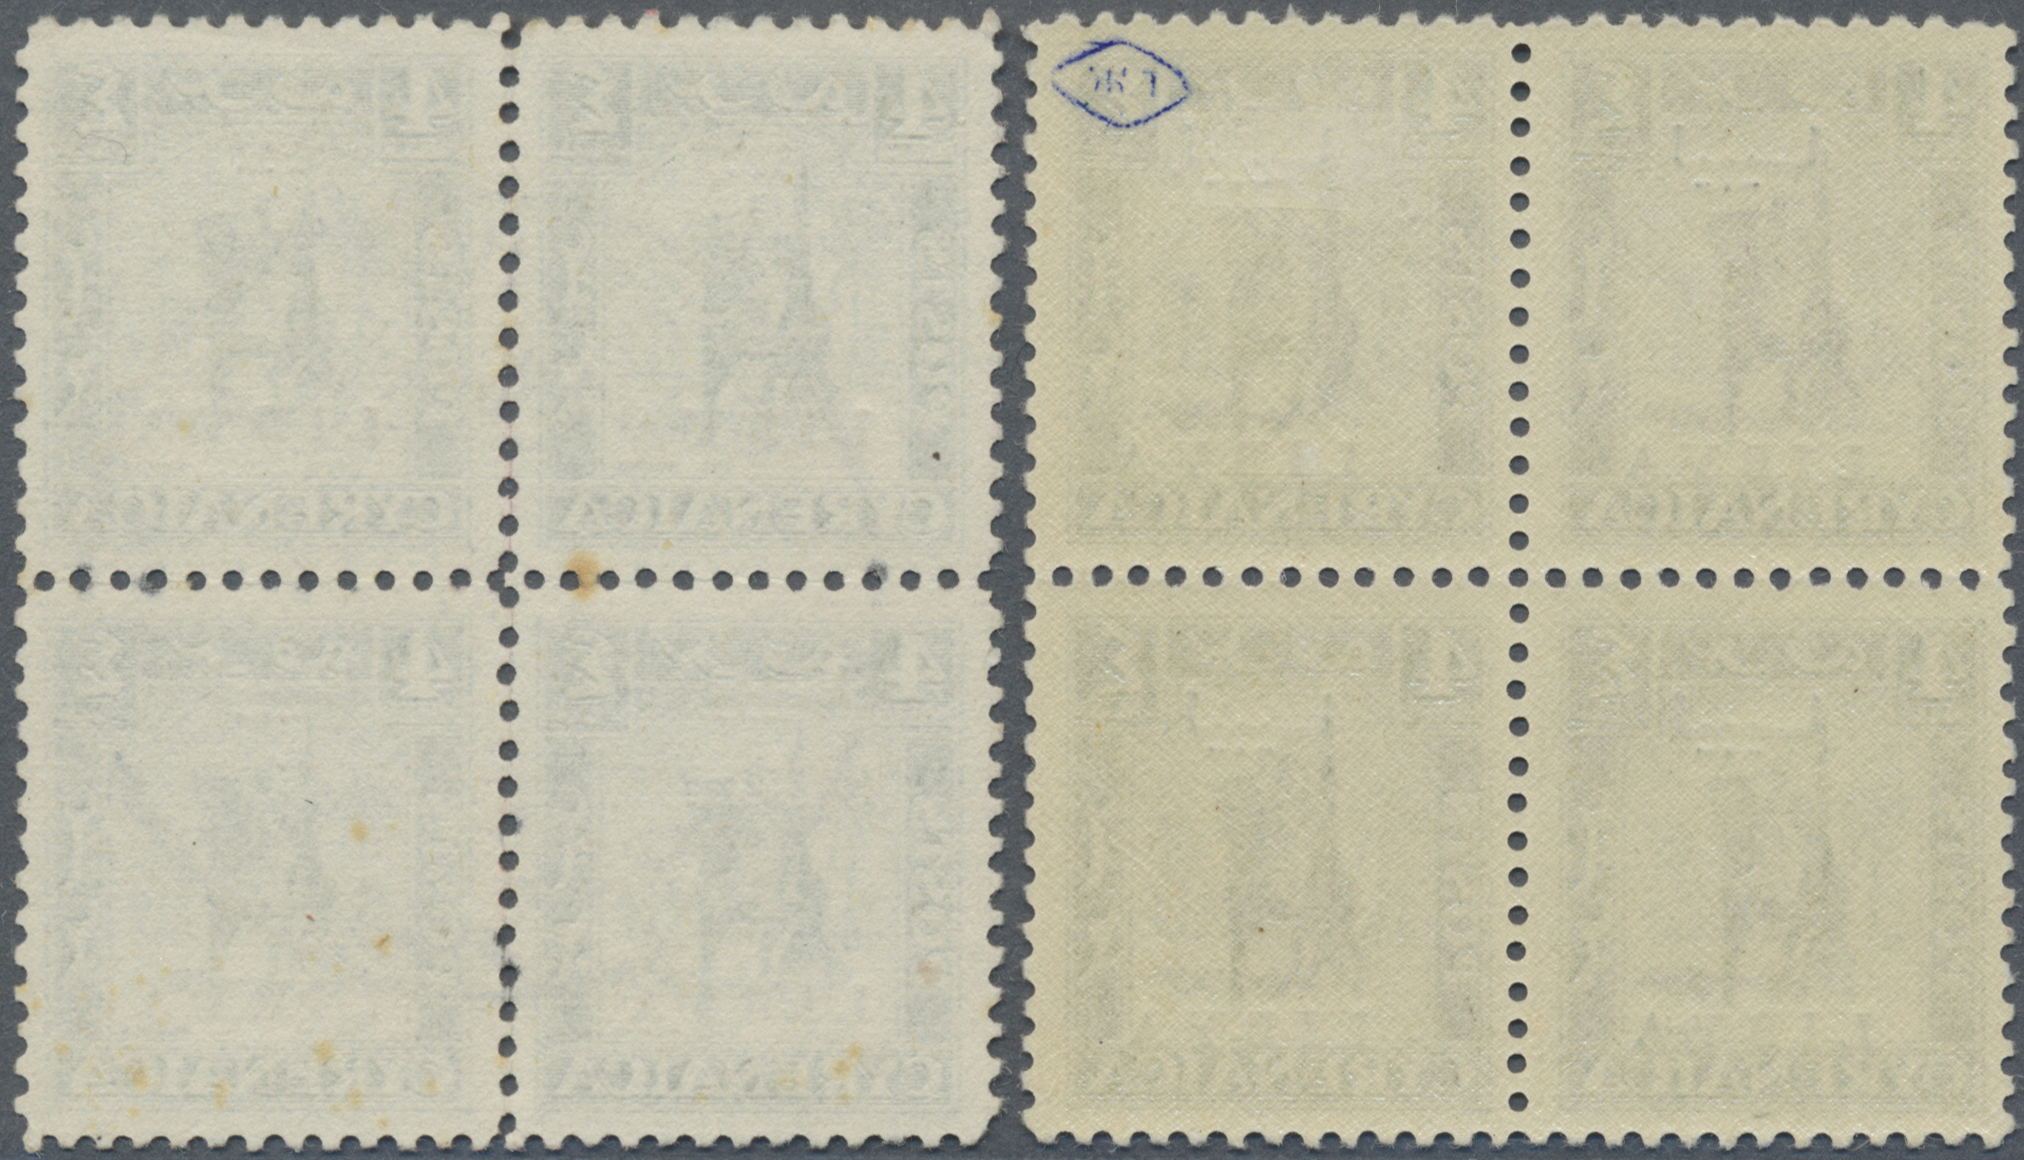 Lot 13974 - libyen  -  Auktionshaus Christoph Gärtner GmbH & Co. KG Single lots Philately Overseas & Europe. Auction #39 Day 4